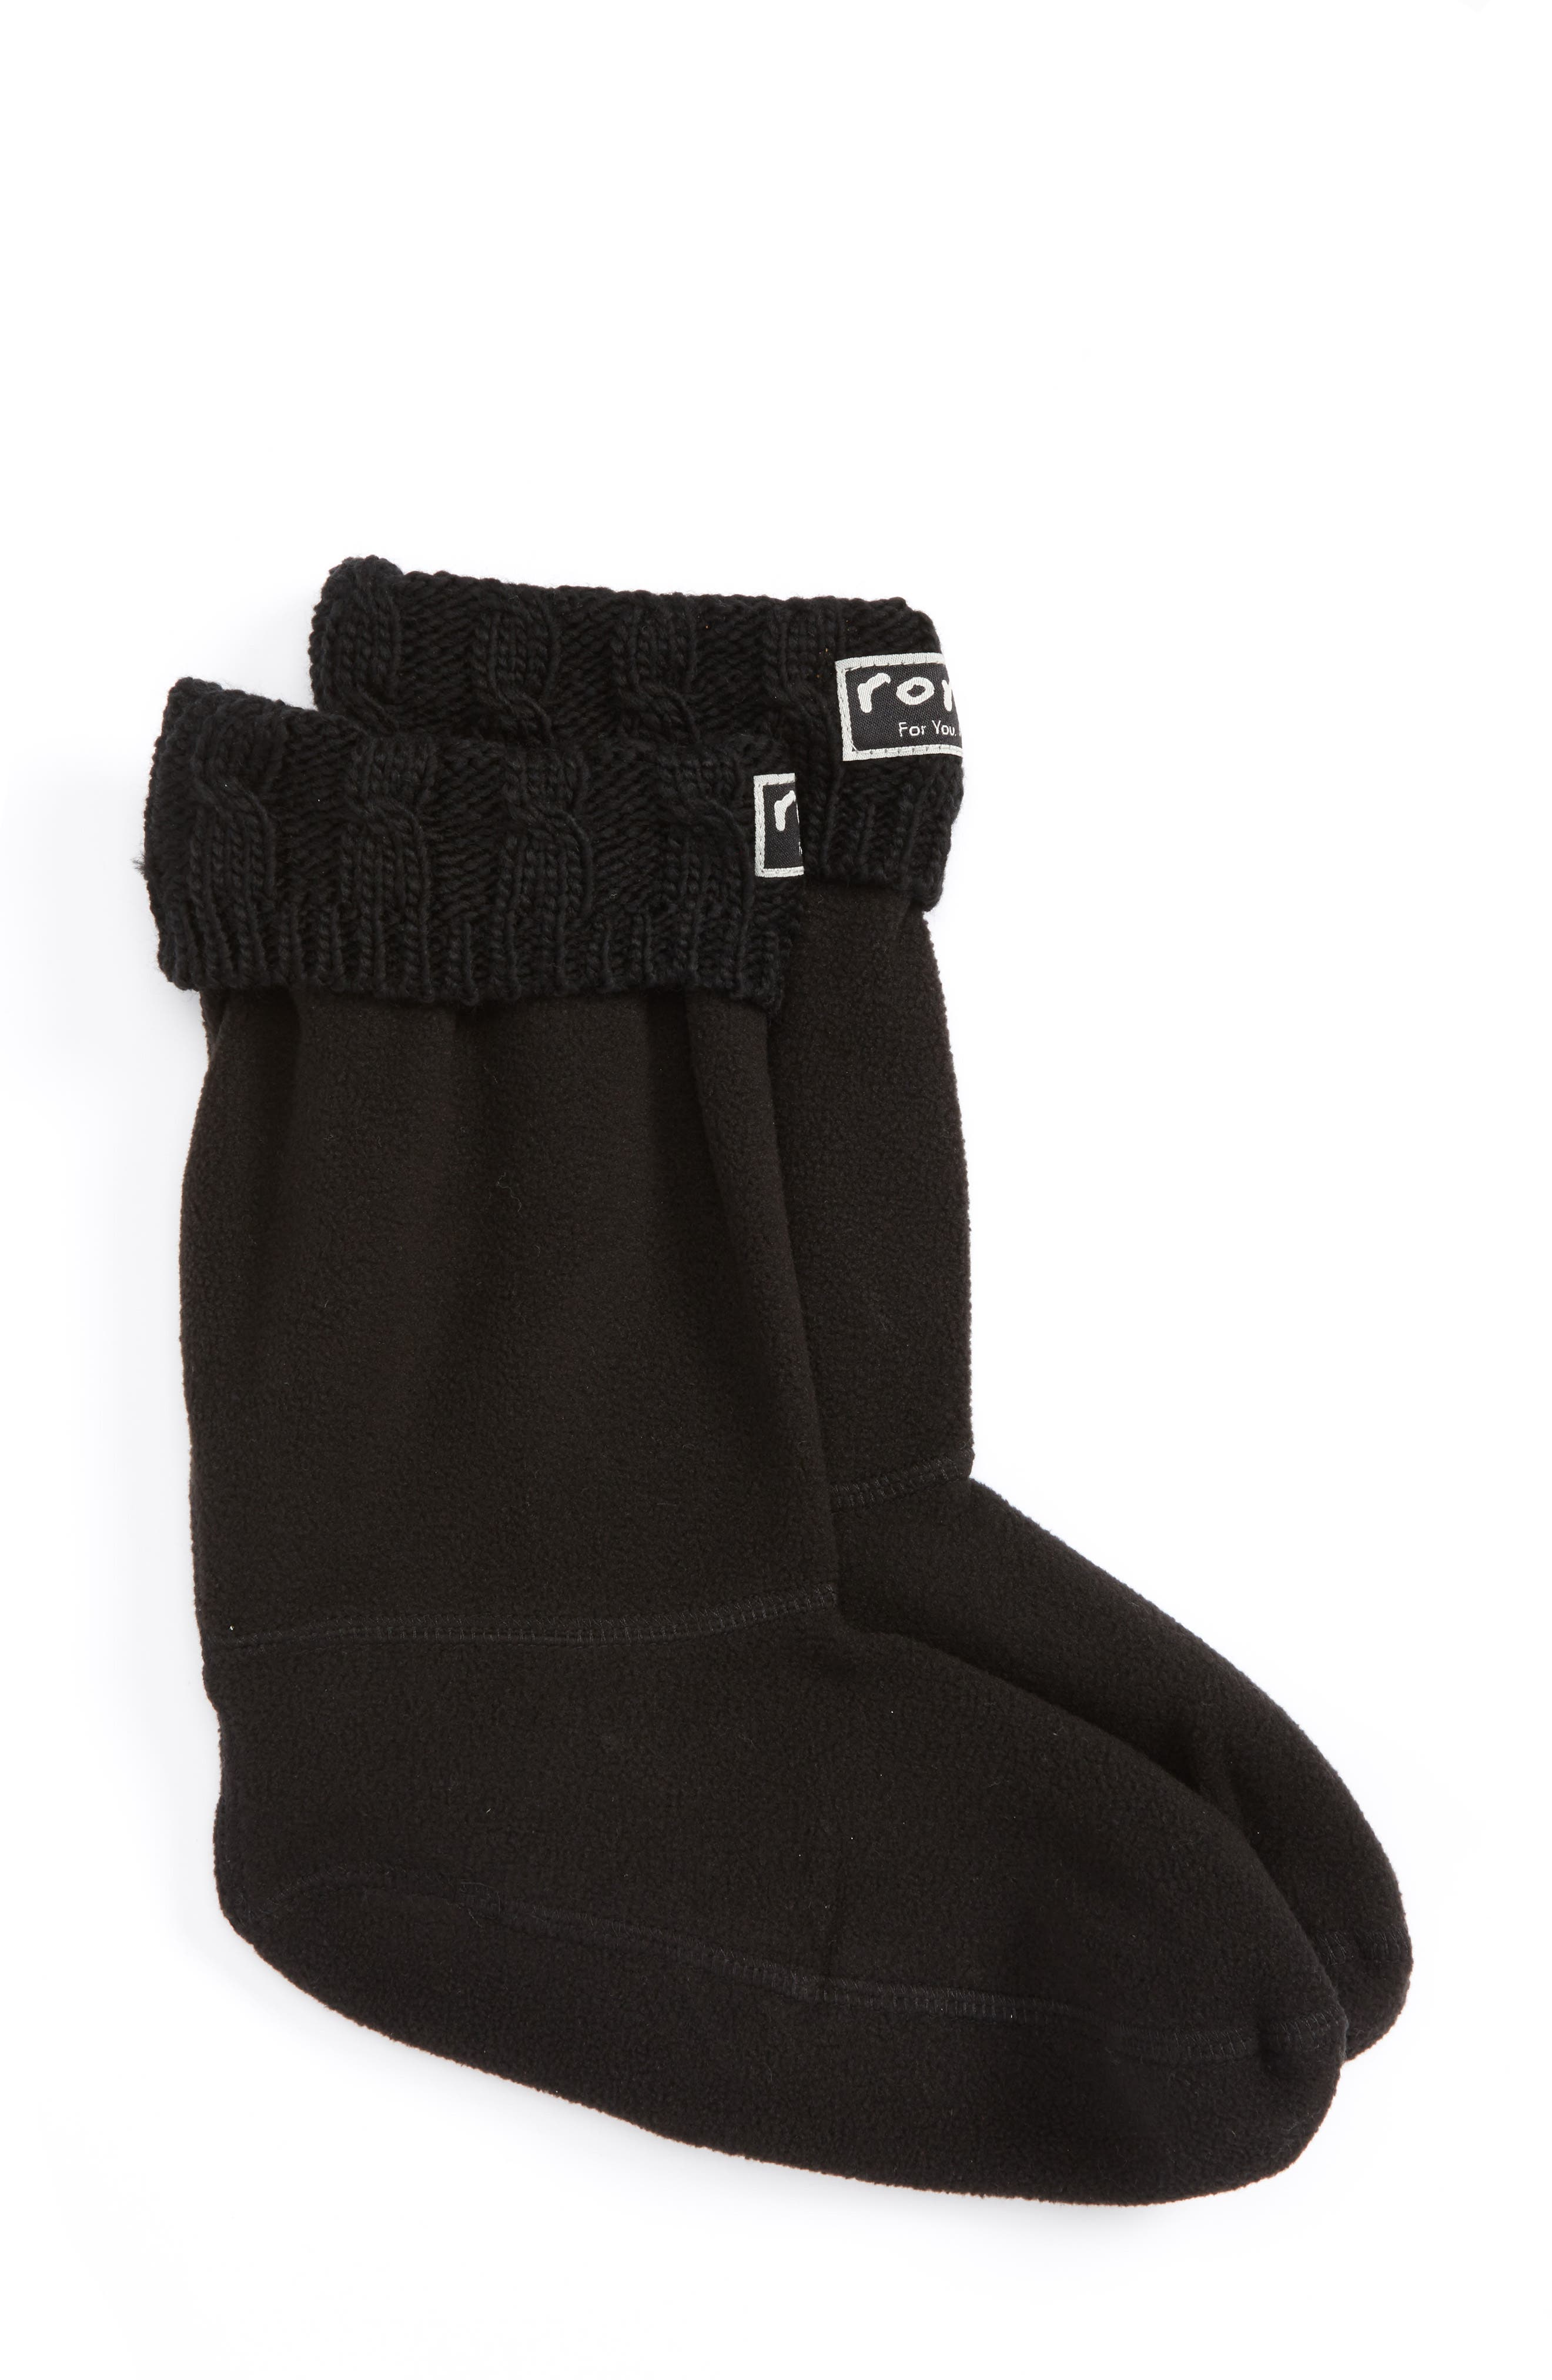 Knit Collar Fleece Boot Socks,                             Main thumbnail 1, color,                             002